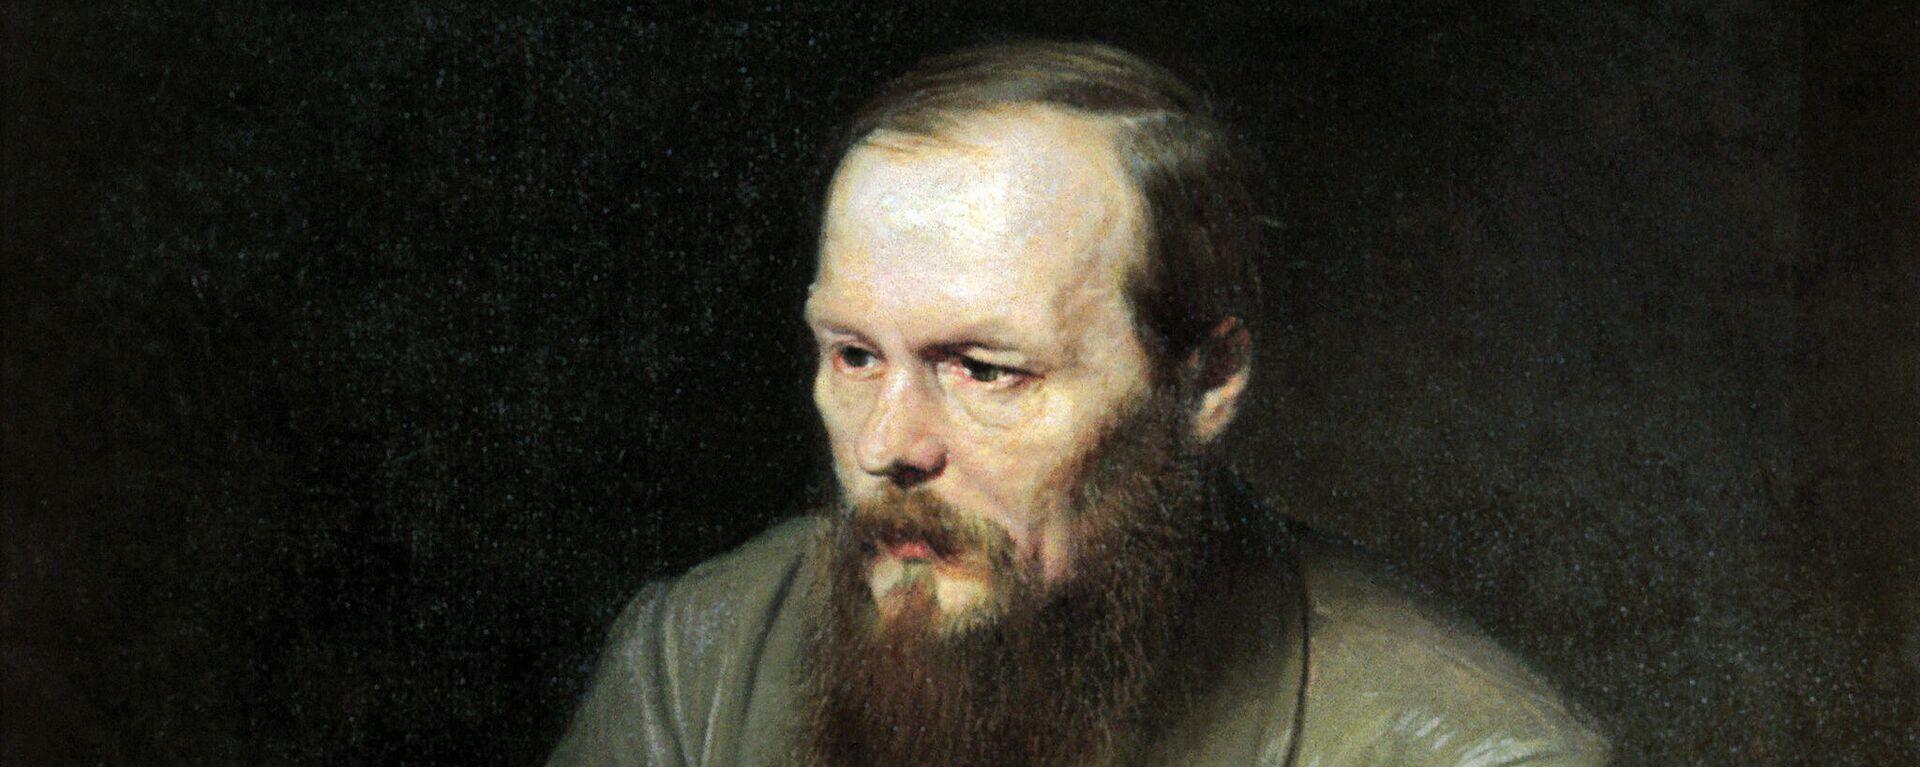 Dostojewski-Porträt von Wassili Perow - SNA, 1920, 11.01.2021